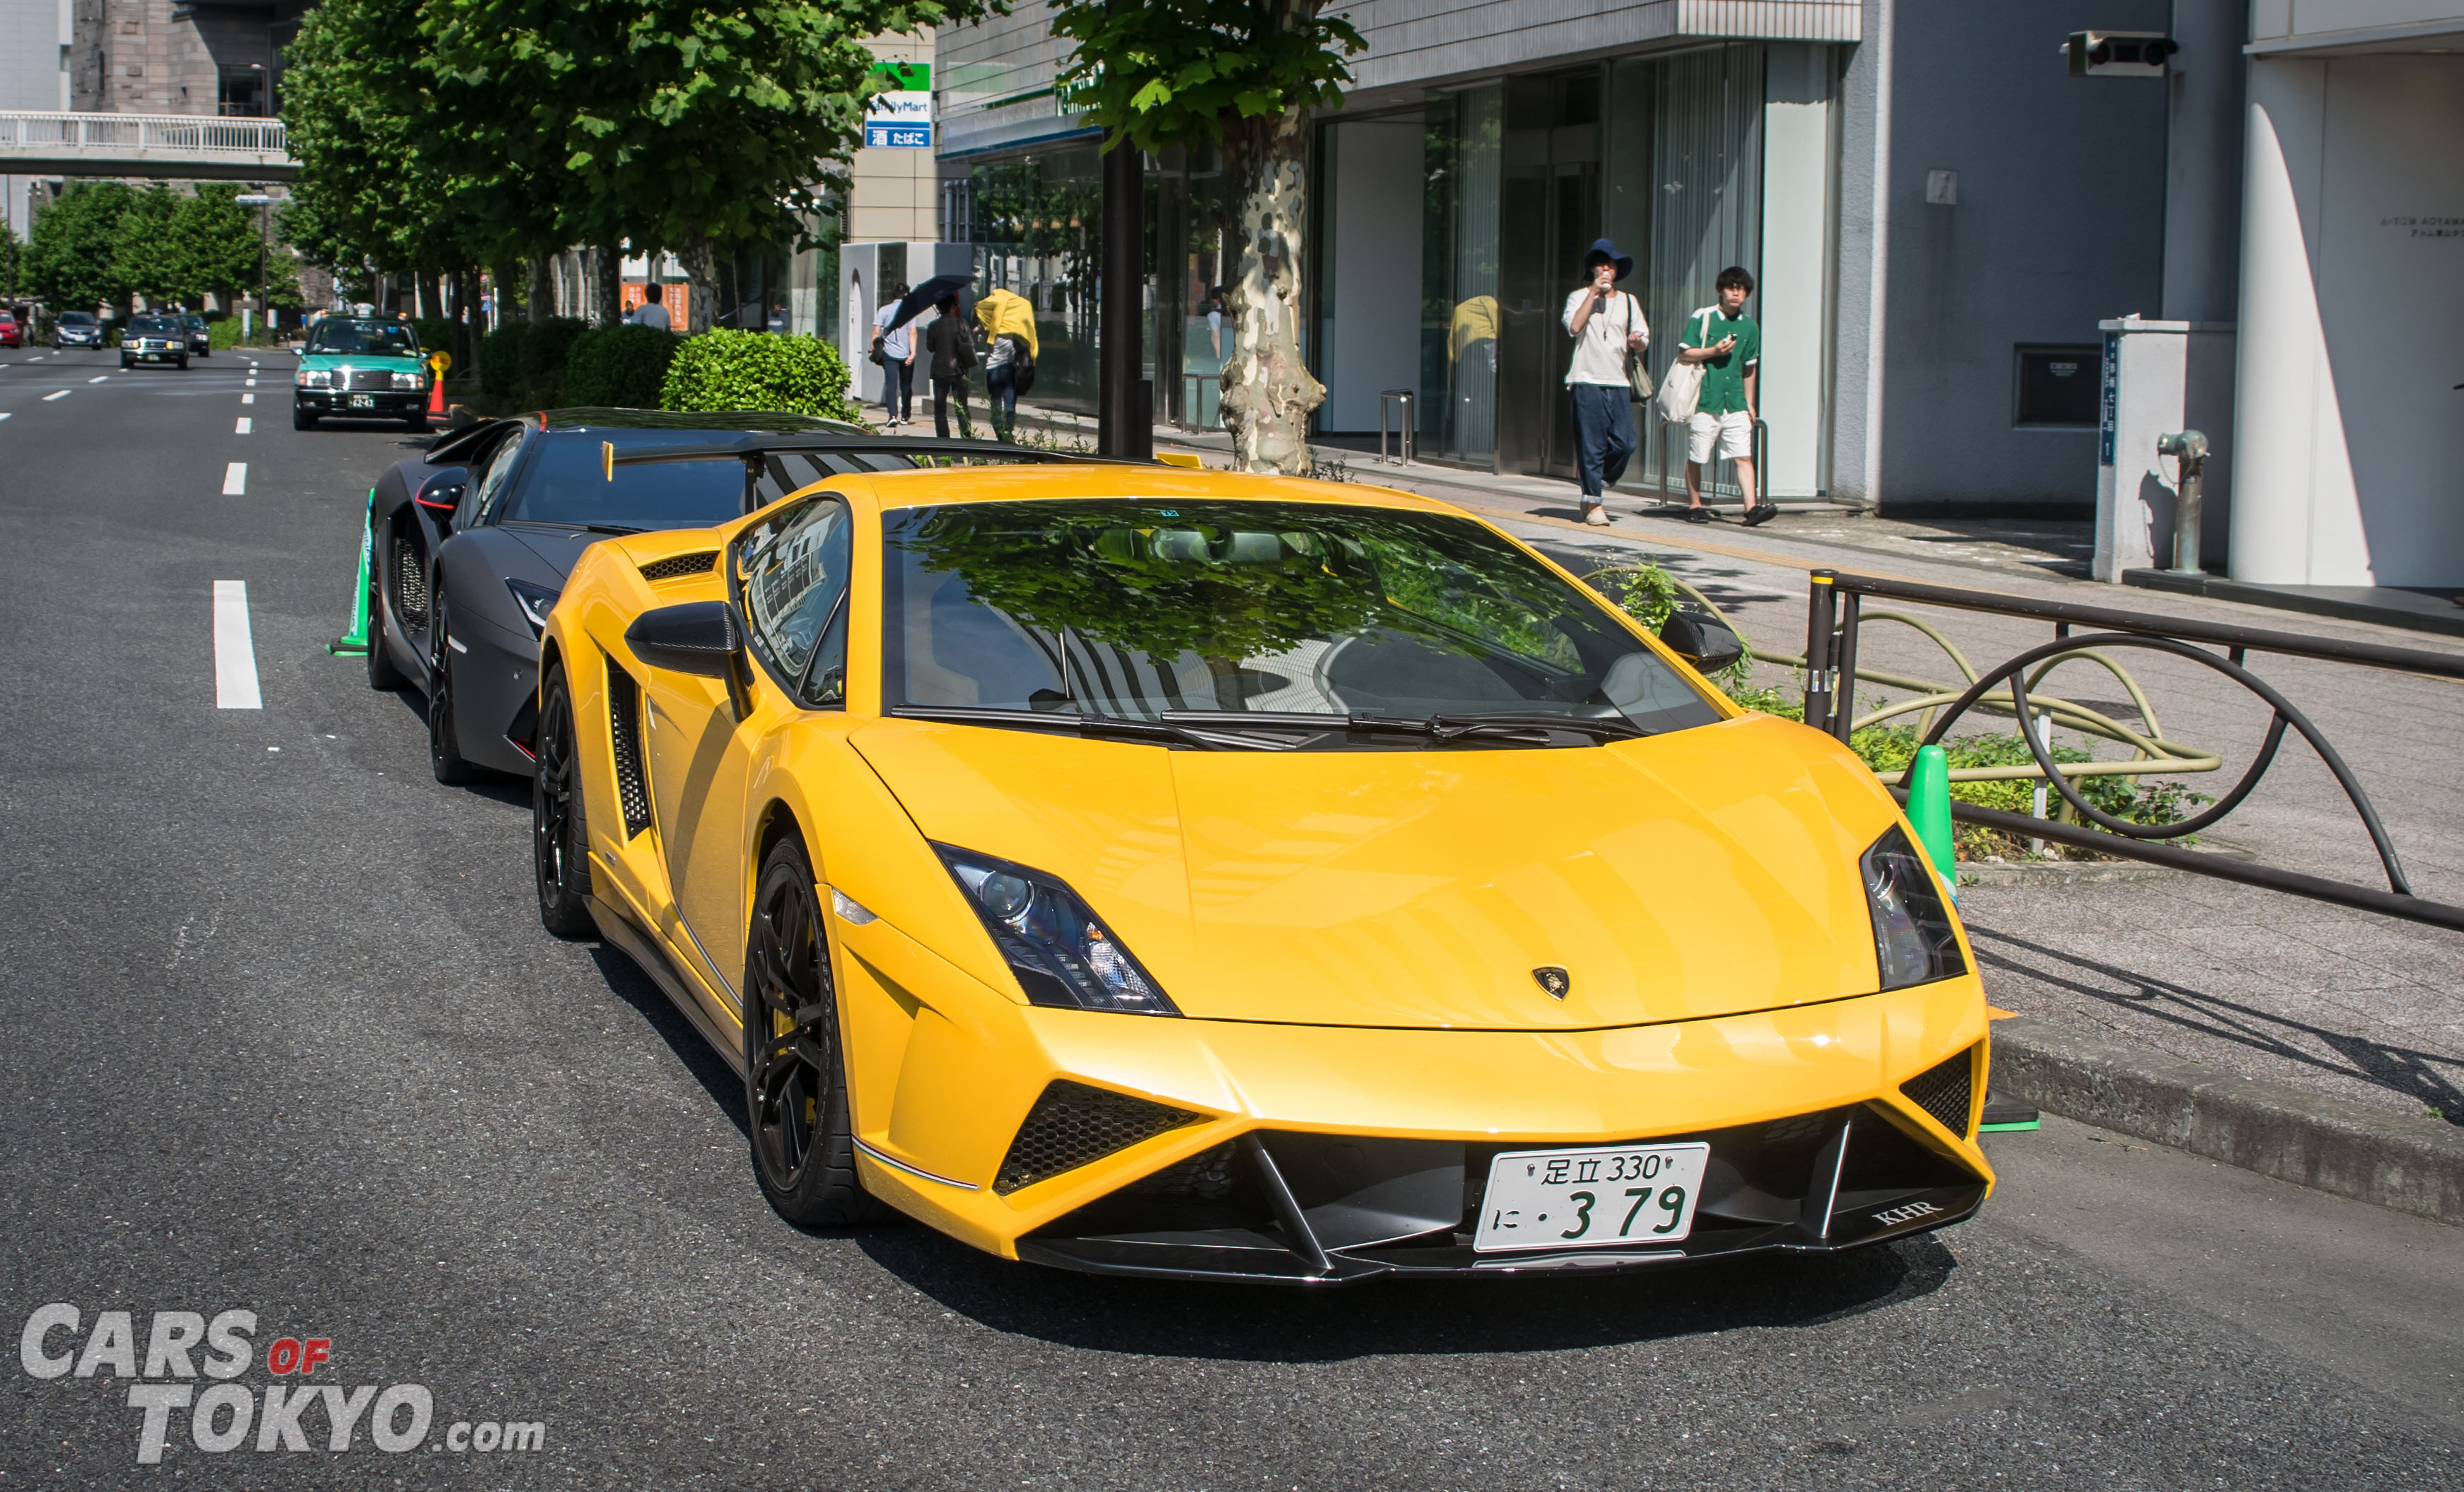 Cars of Tokyo Clean Lamborghini Gallardo Squadra Corsa